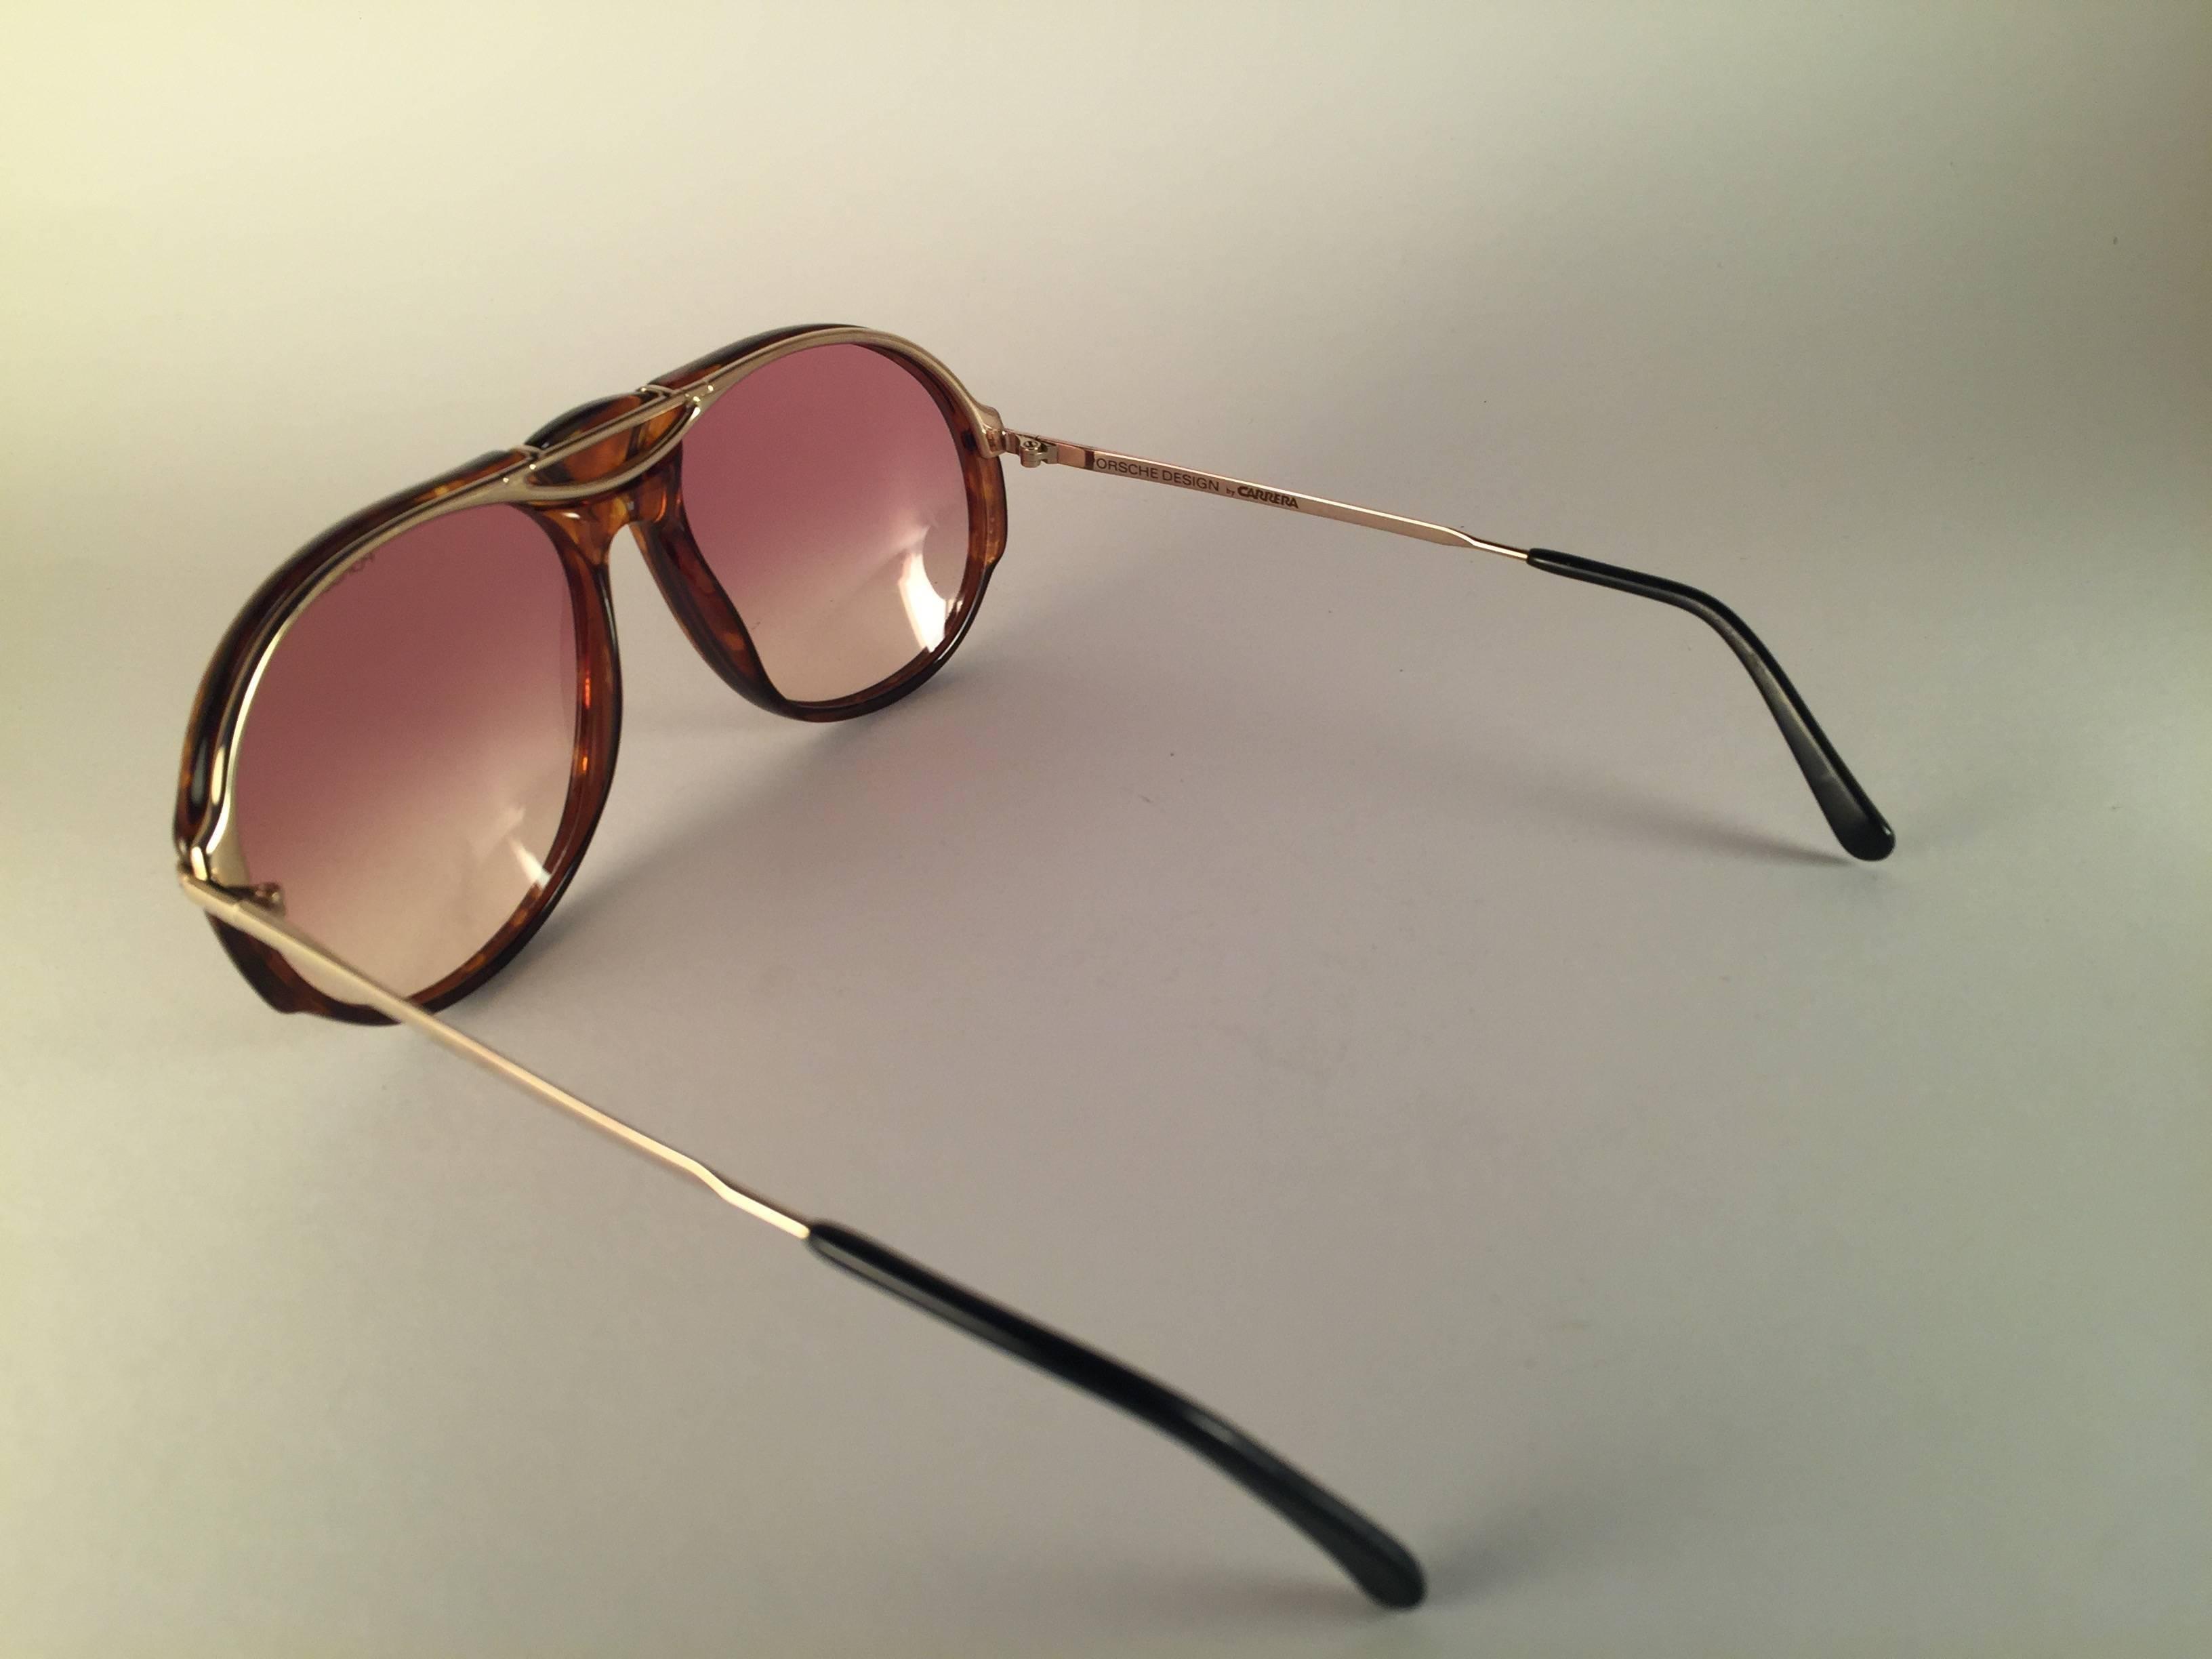 c73060a16161 New Vintage Porsche Design By Carrera 5659 Tortoise Large Sunglasses Austria  For Sale at 1stdibs